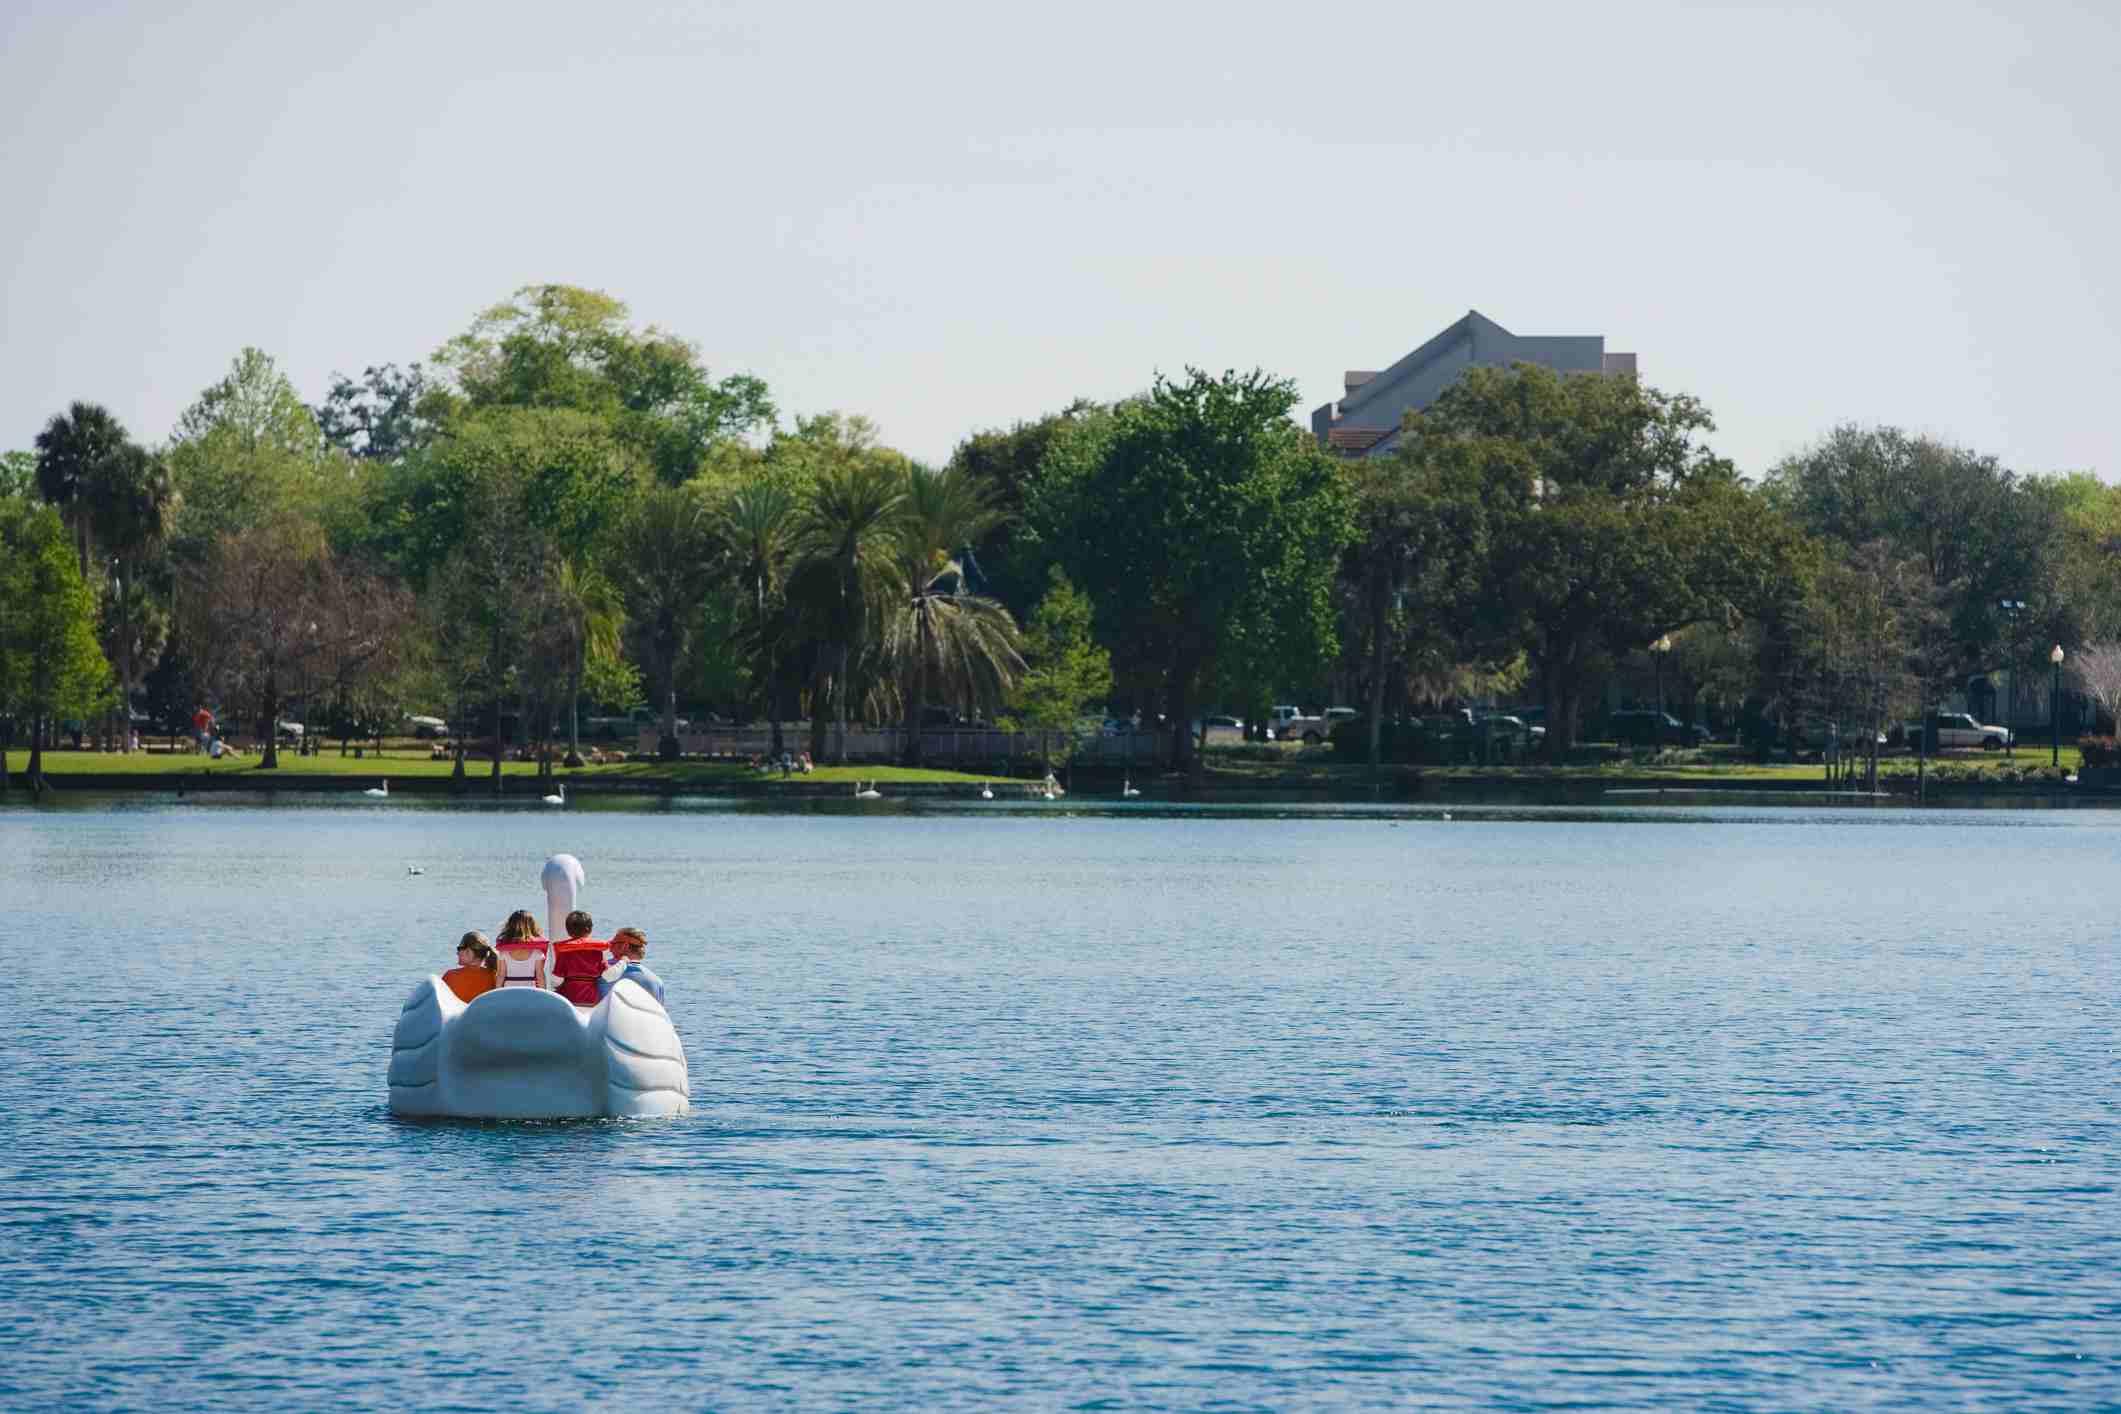 Four people on a pedal boat, Lake Eola Park, Orlando